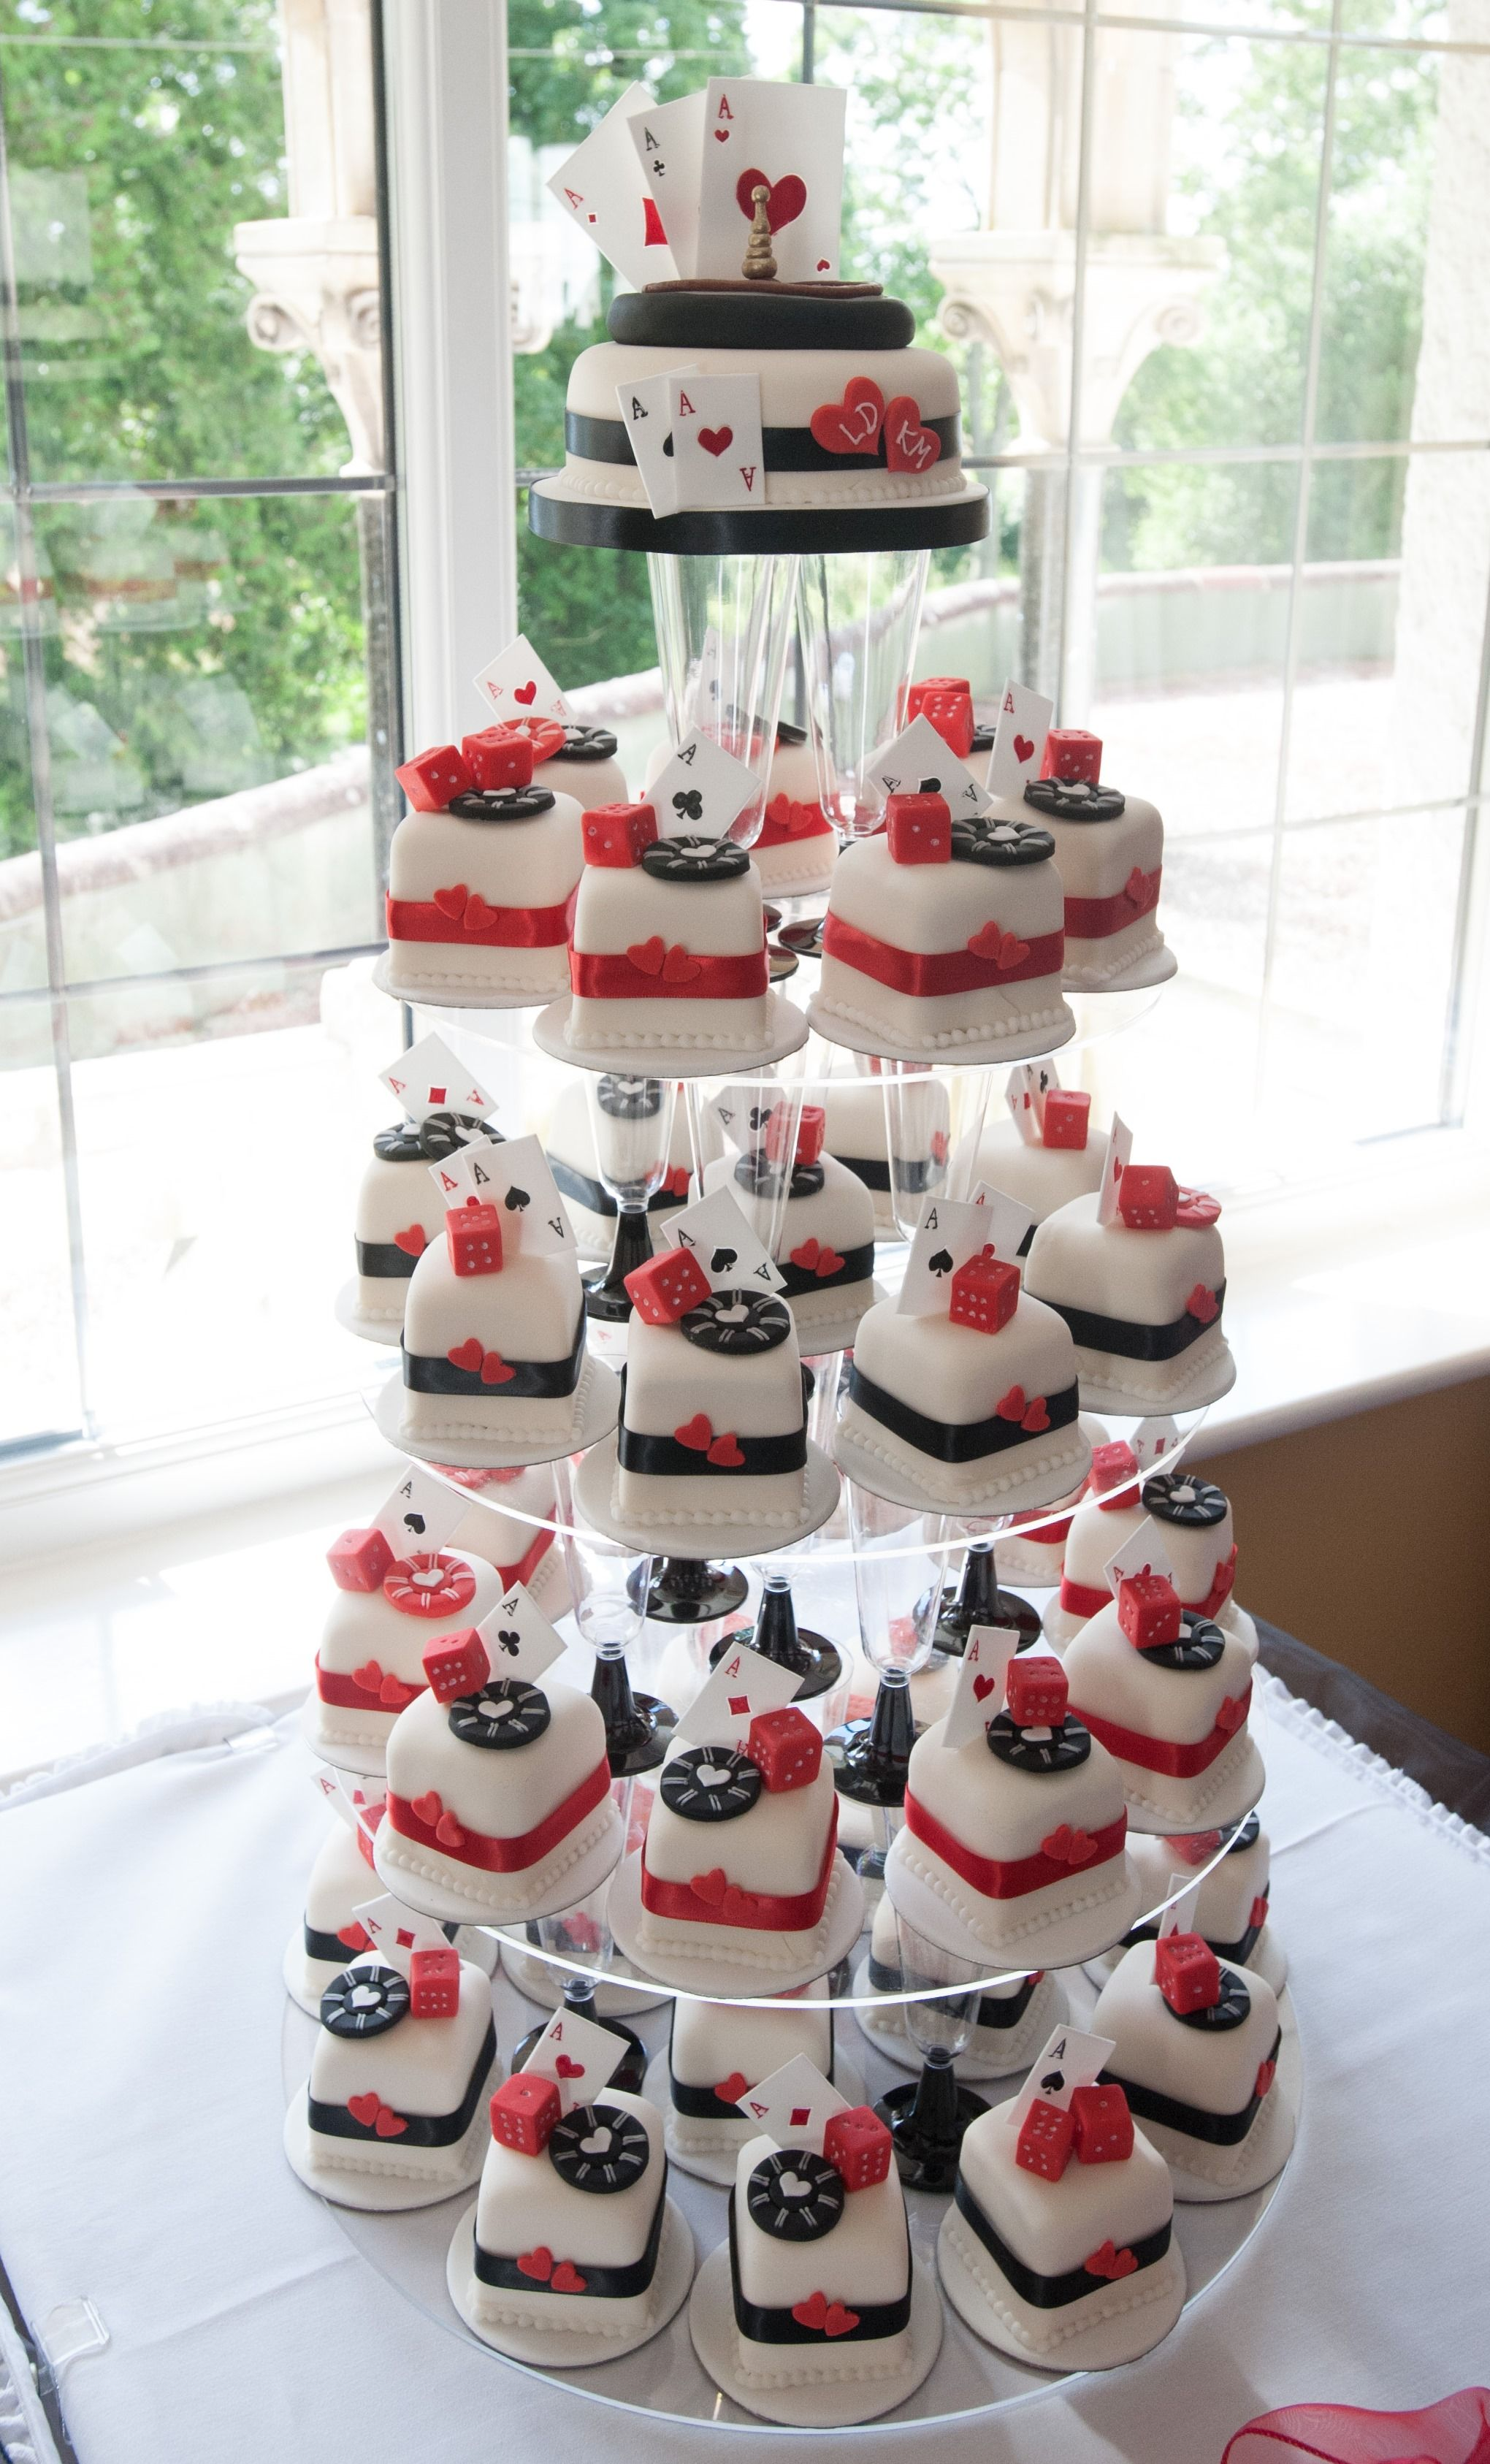 These Las Vegas Mini Wedding Cake Or Cupcakes Are Super Adorable Yet Elegant